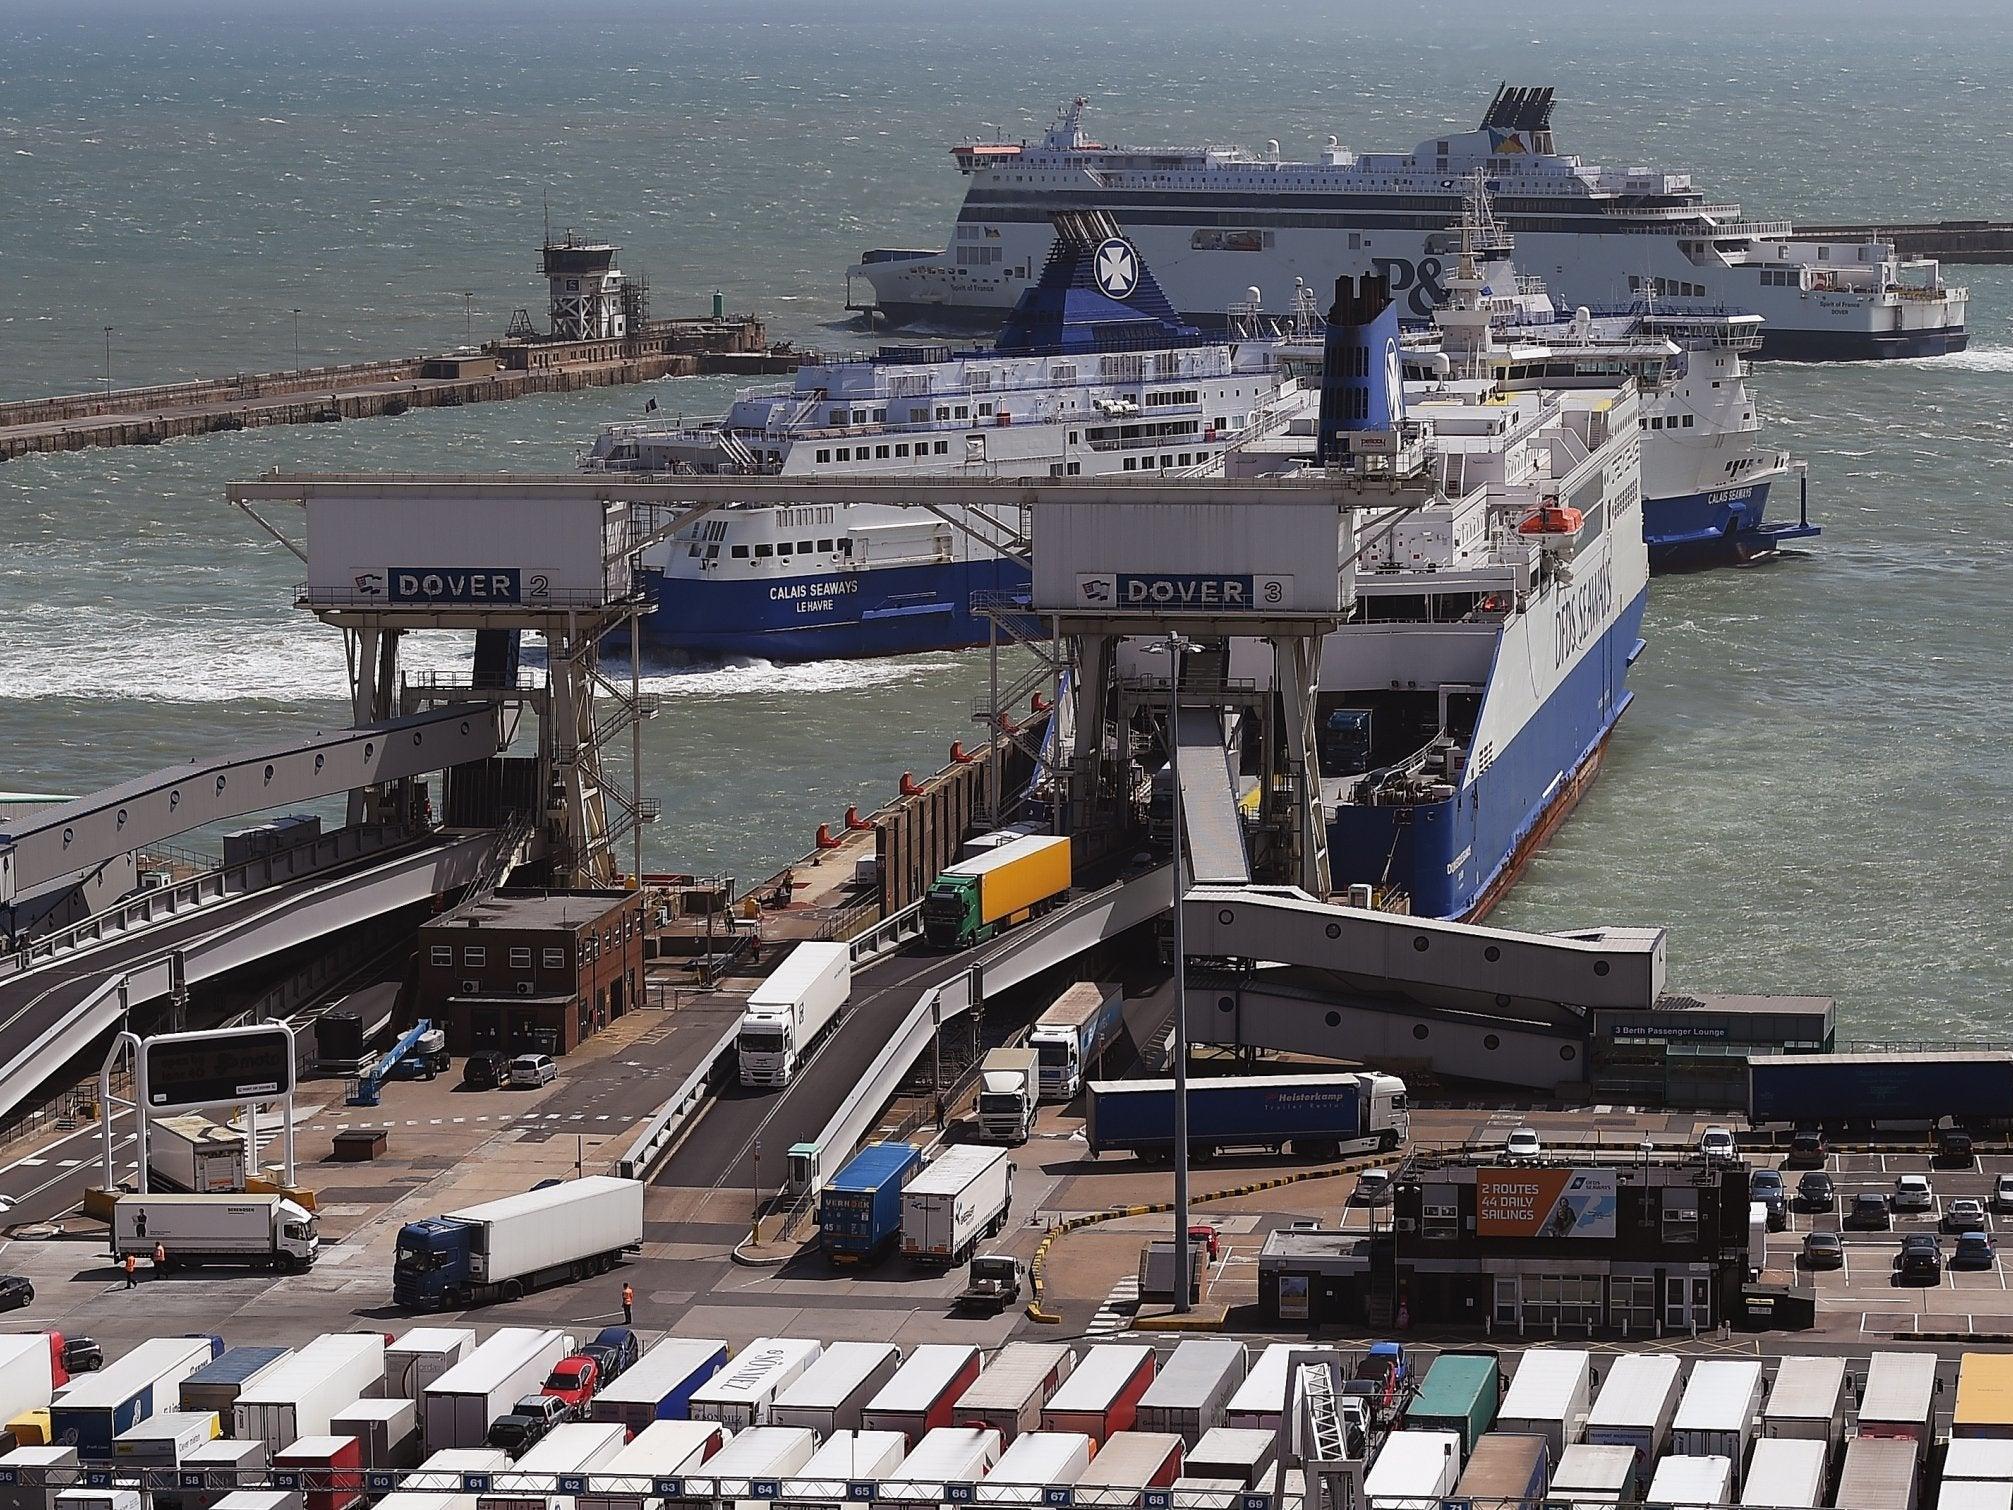 Ferry company awarded £13 8m government contract despite